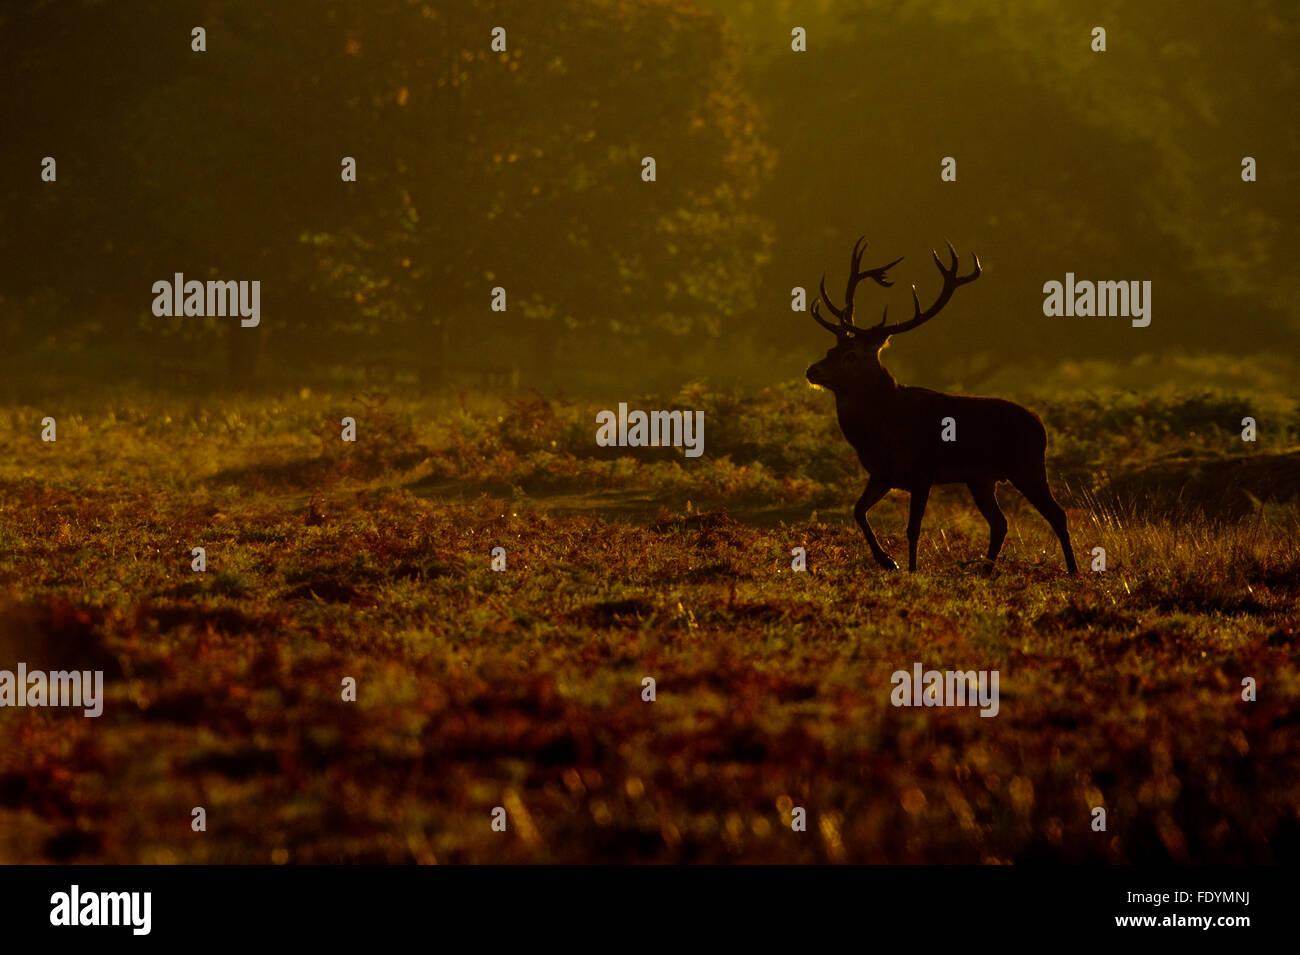 Red Deer (Cervus elaphus) stag en lumière du matin Banque D'Images